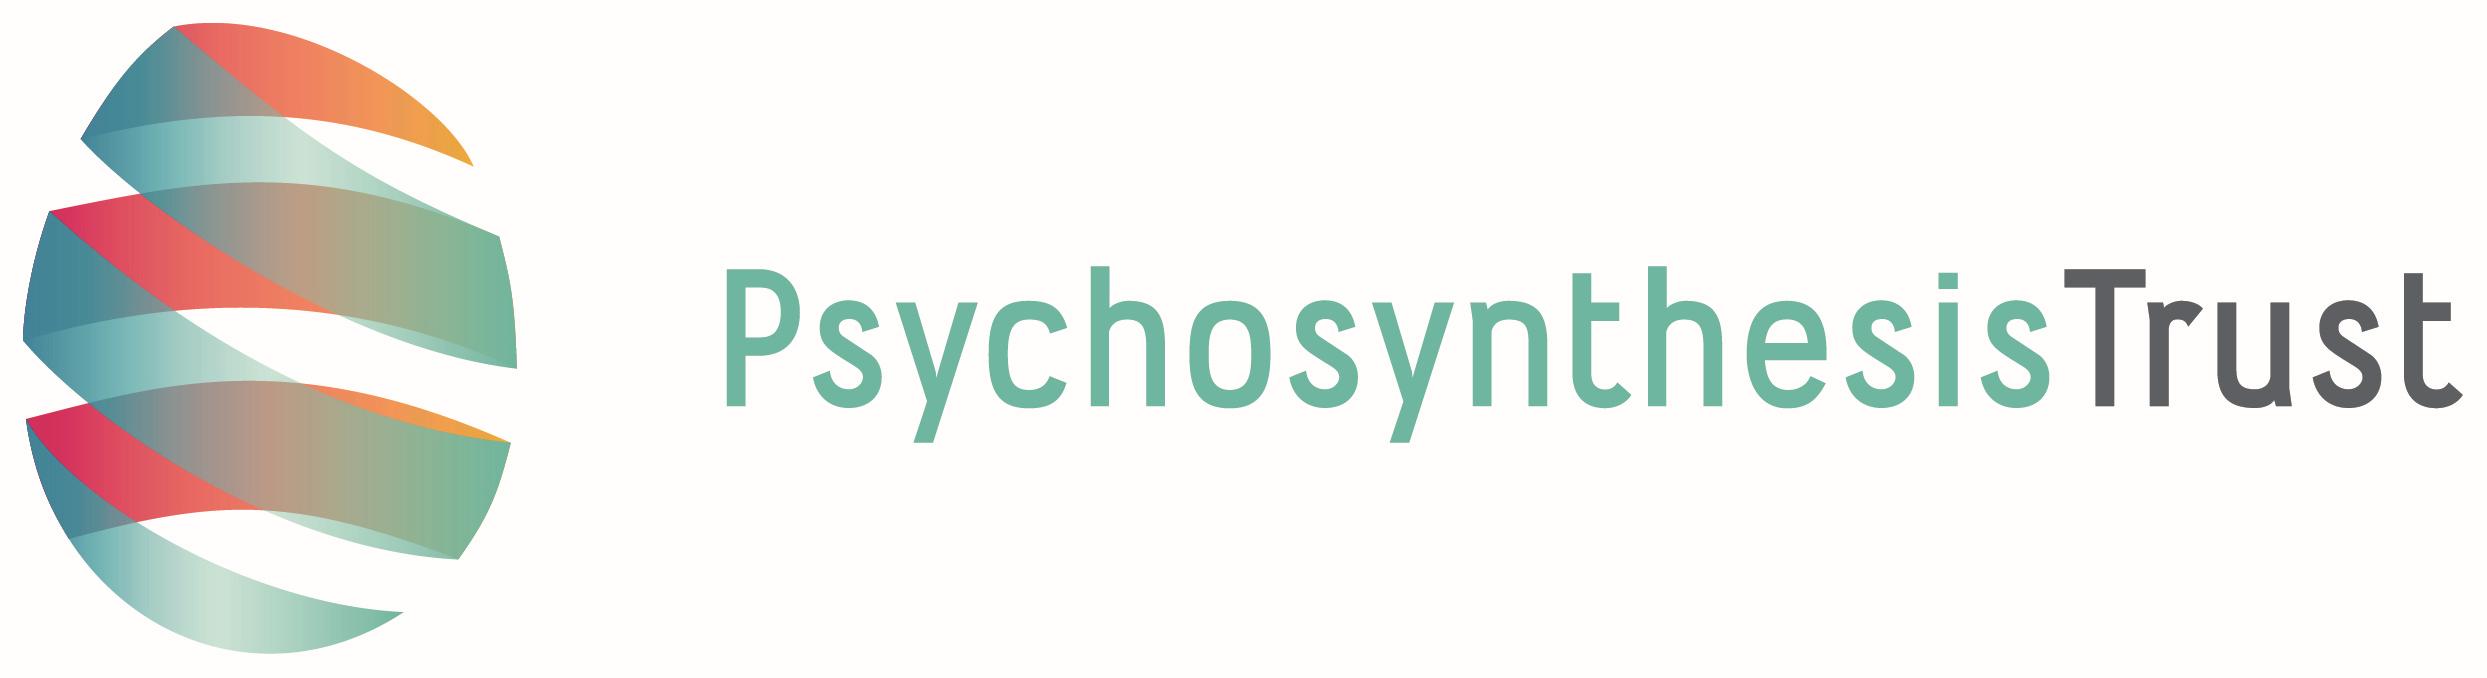 Psychosynthesis Trust